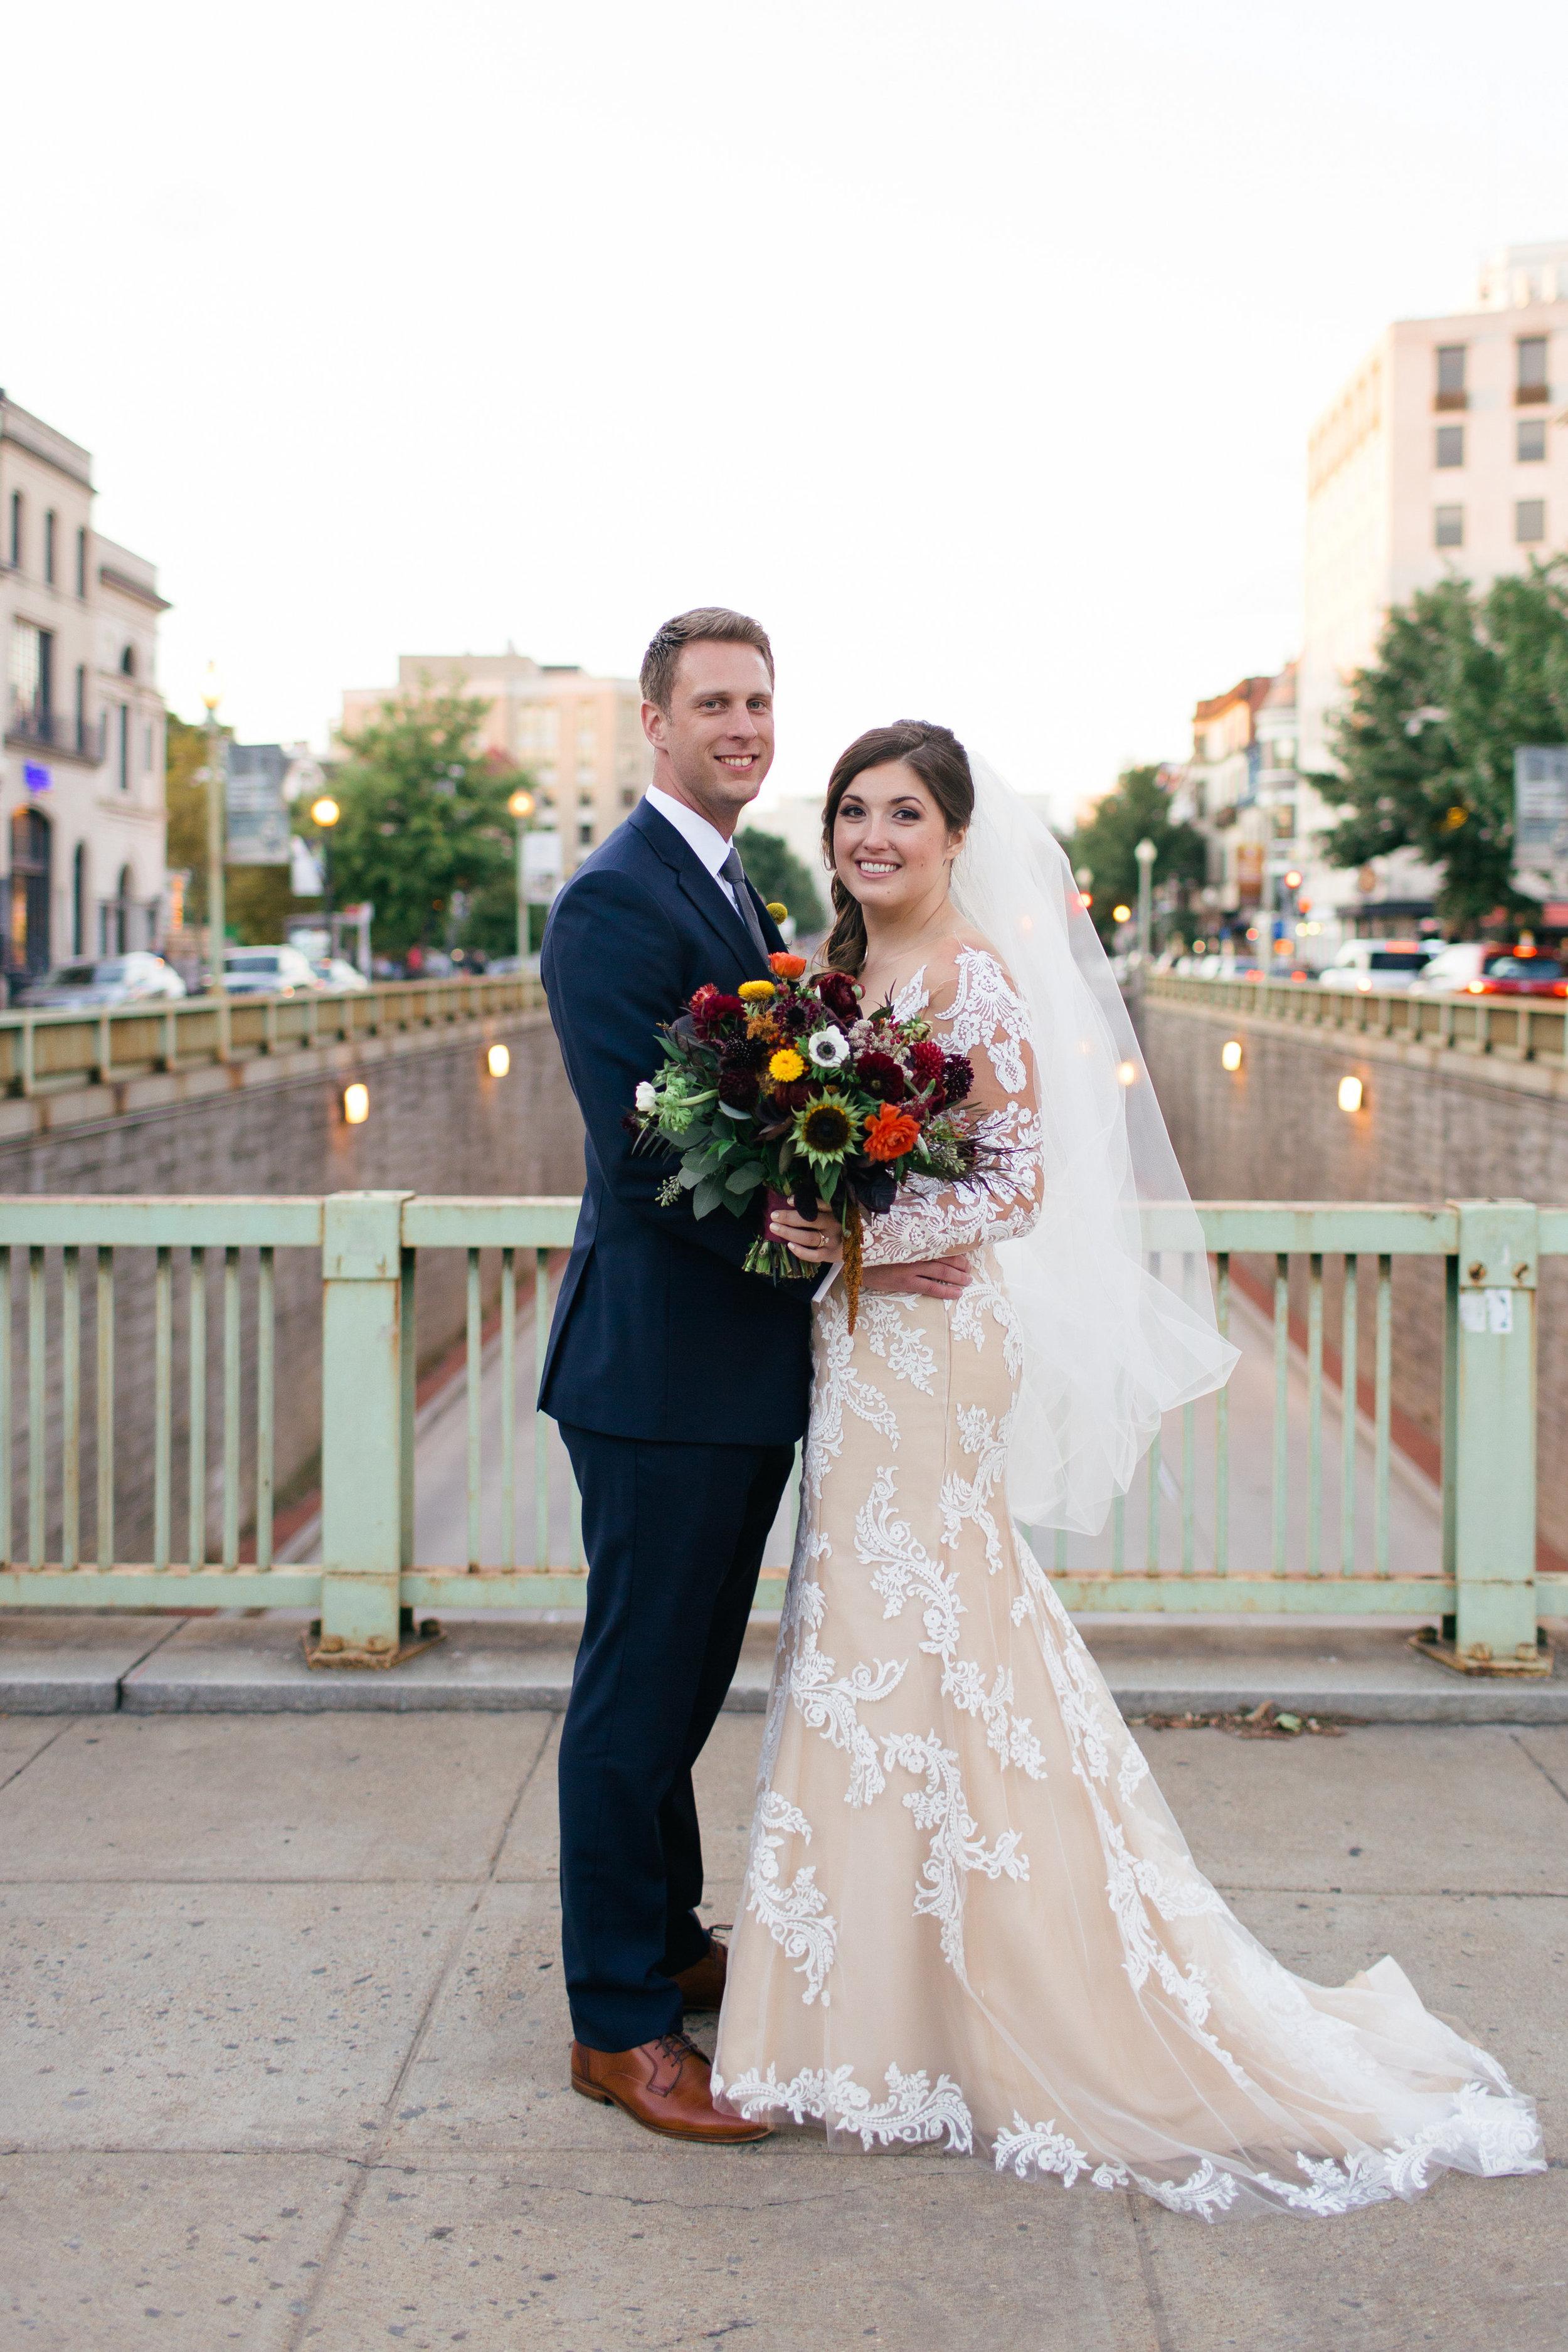 Dupon Circle Wedding | Washington DC Wedding Photography | Rebecca Wilcher Photography -27.jpg